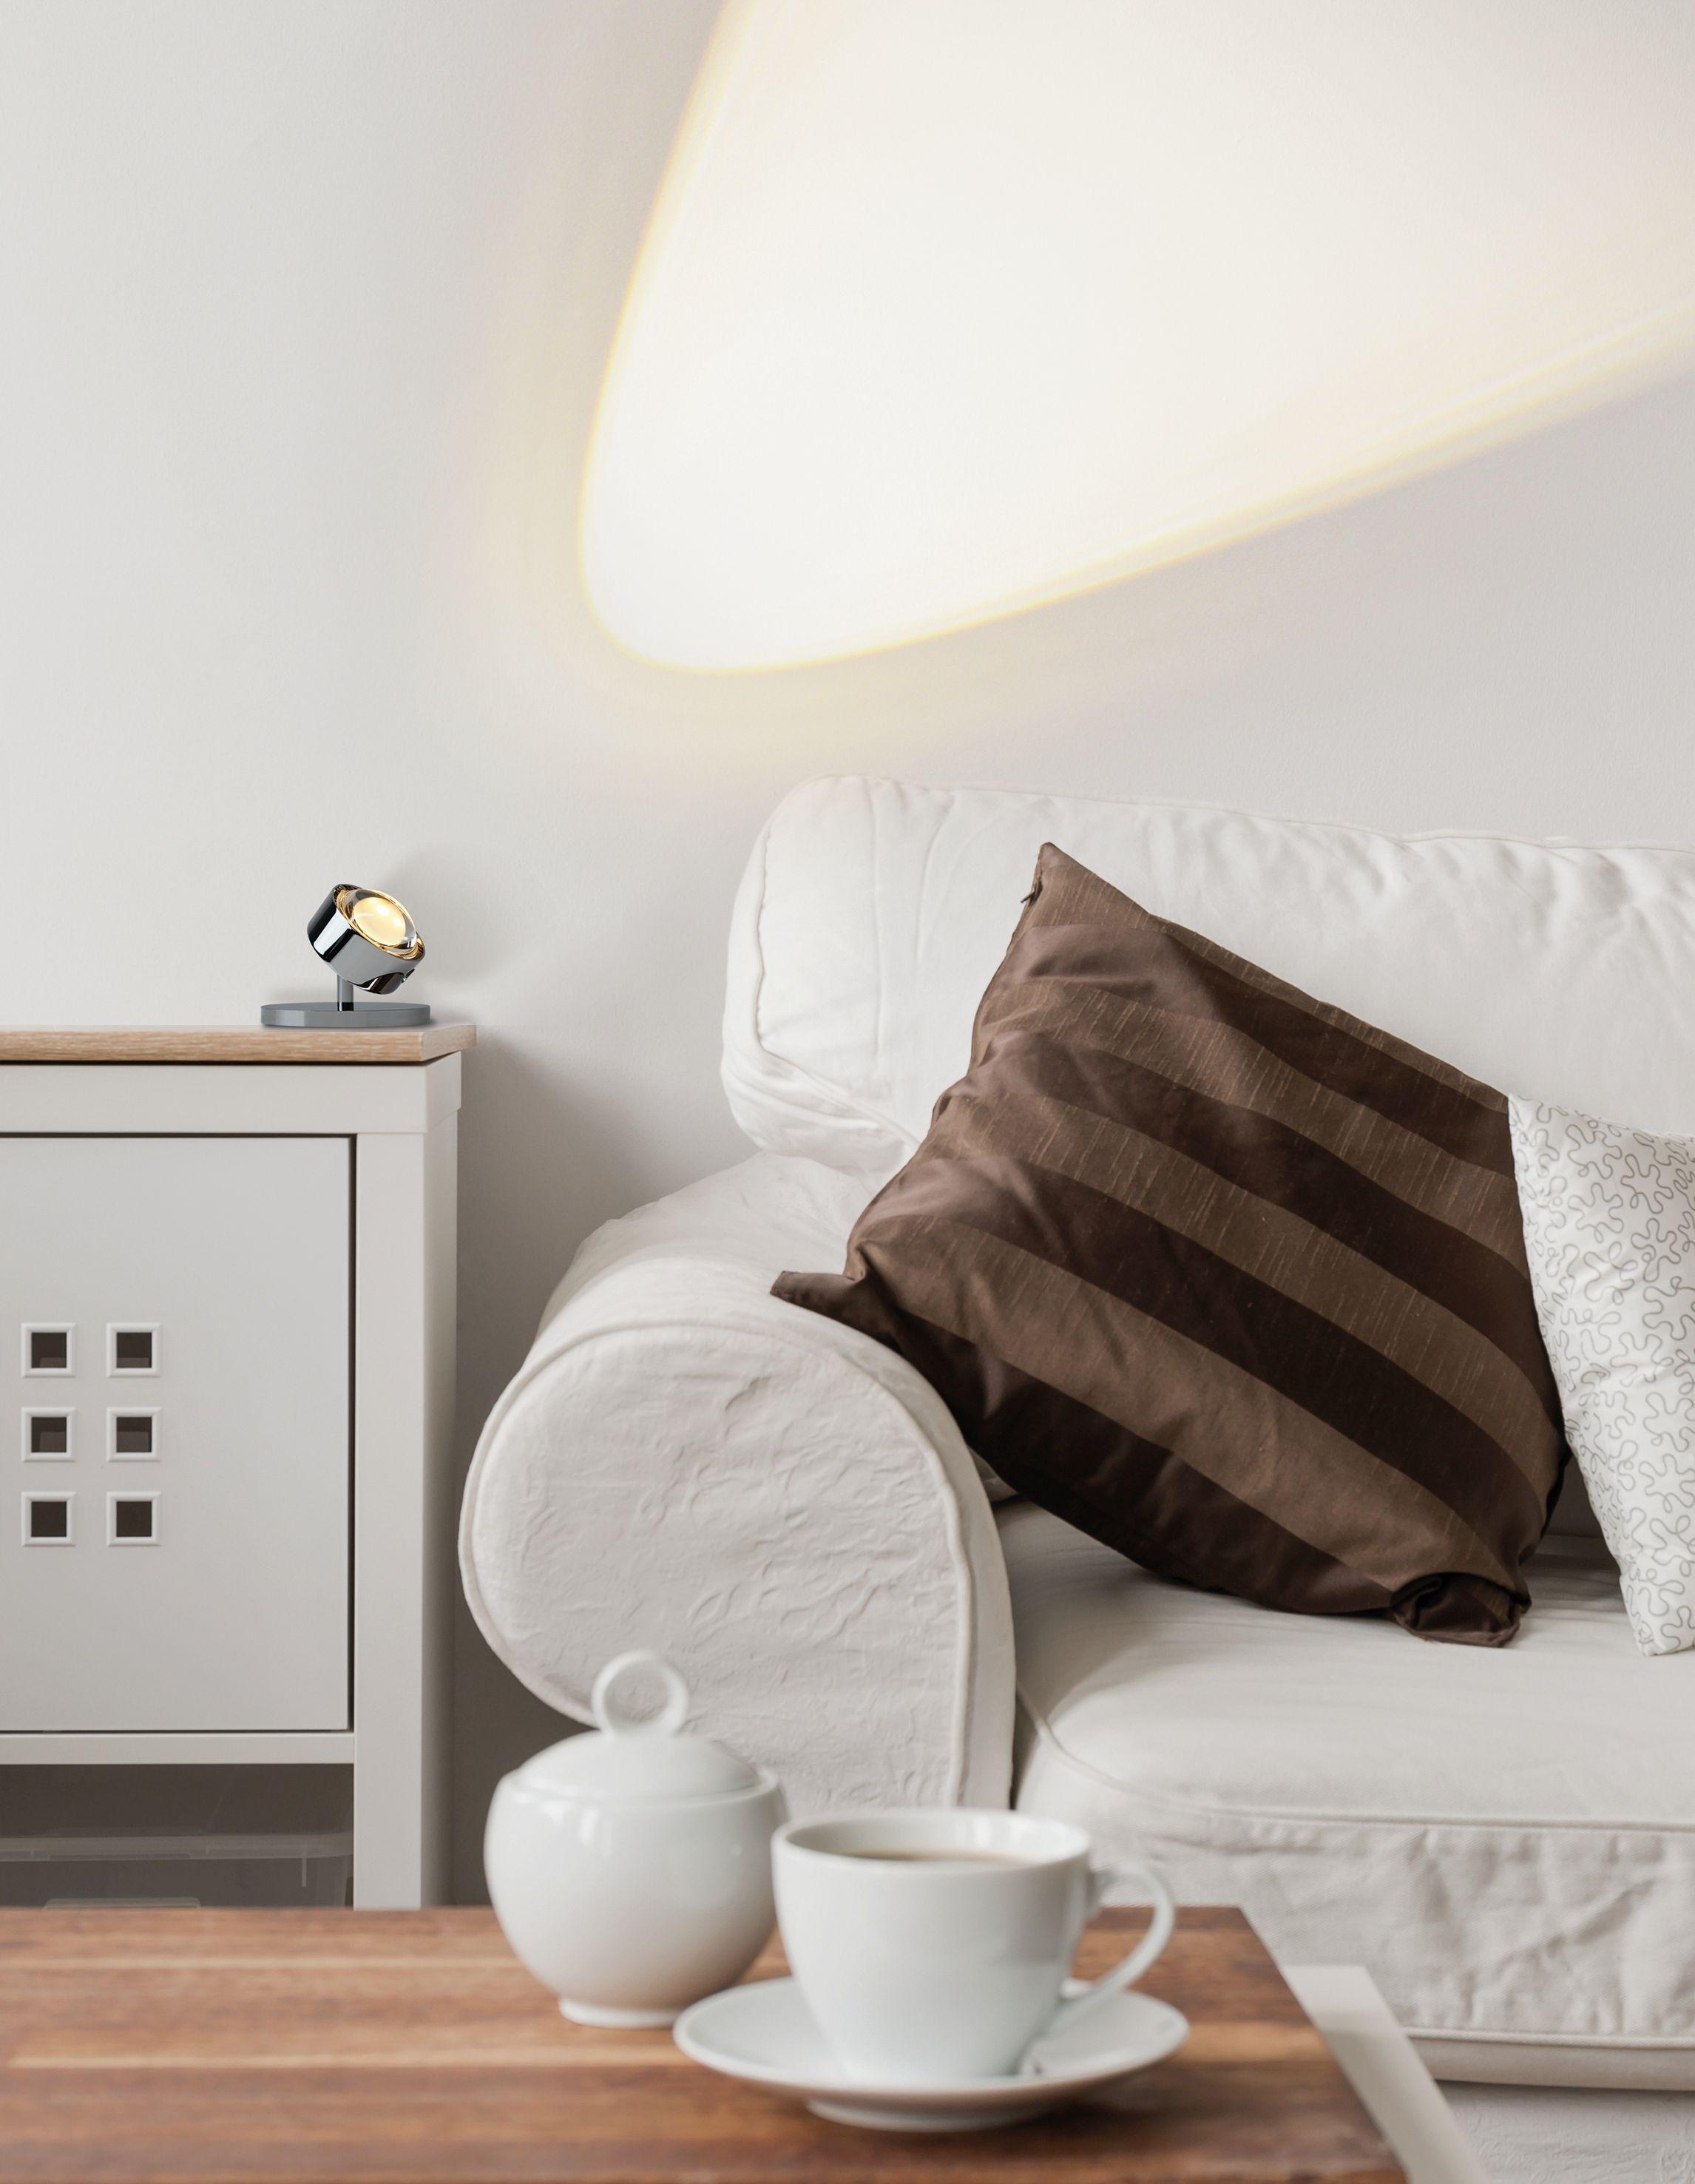 Puk Maxx Spot + G9 Fassung + LED Retrofit - Lagerräumung -